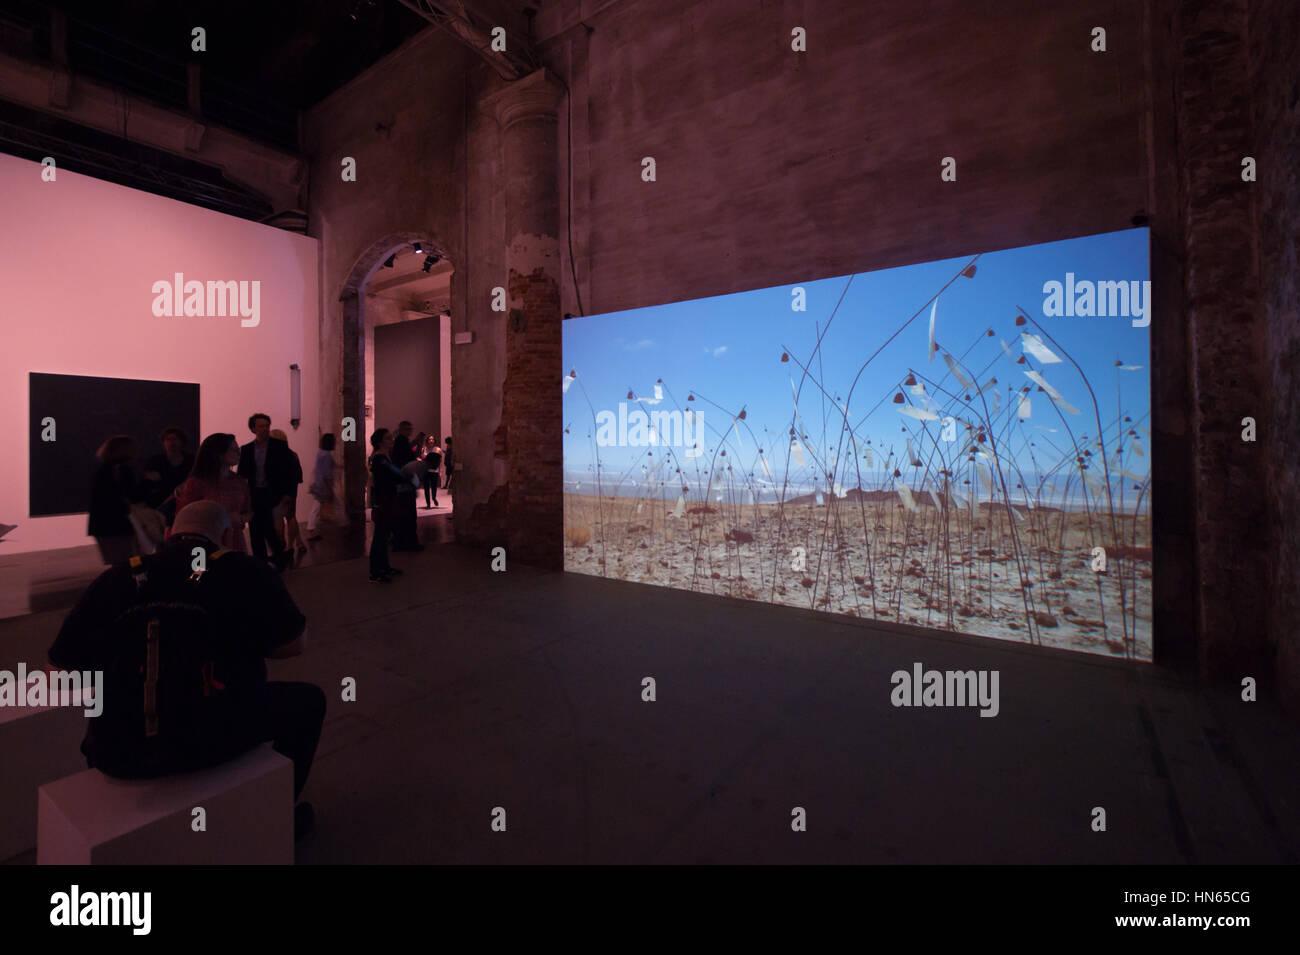 Venice Art Biennale 2015: the video artwork 'Animitas' by Christian Boltanski - Stock Image